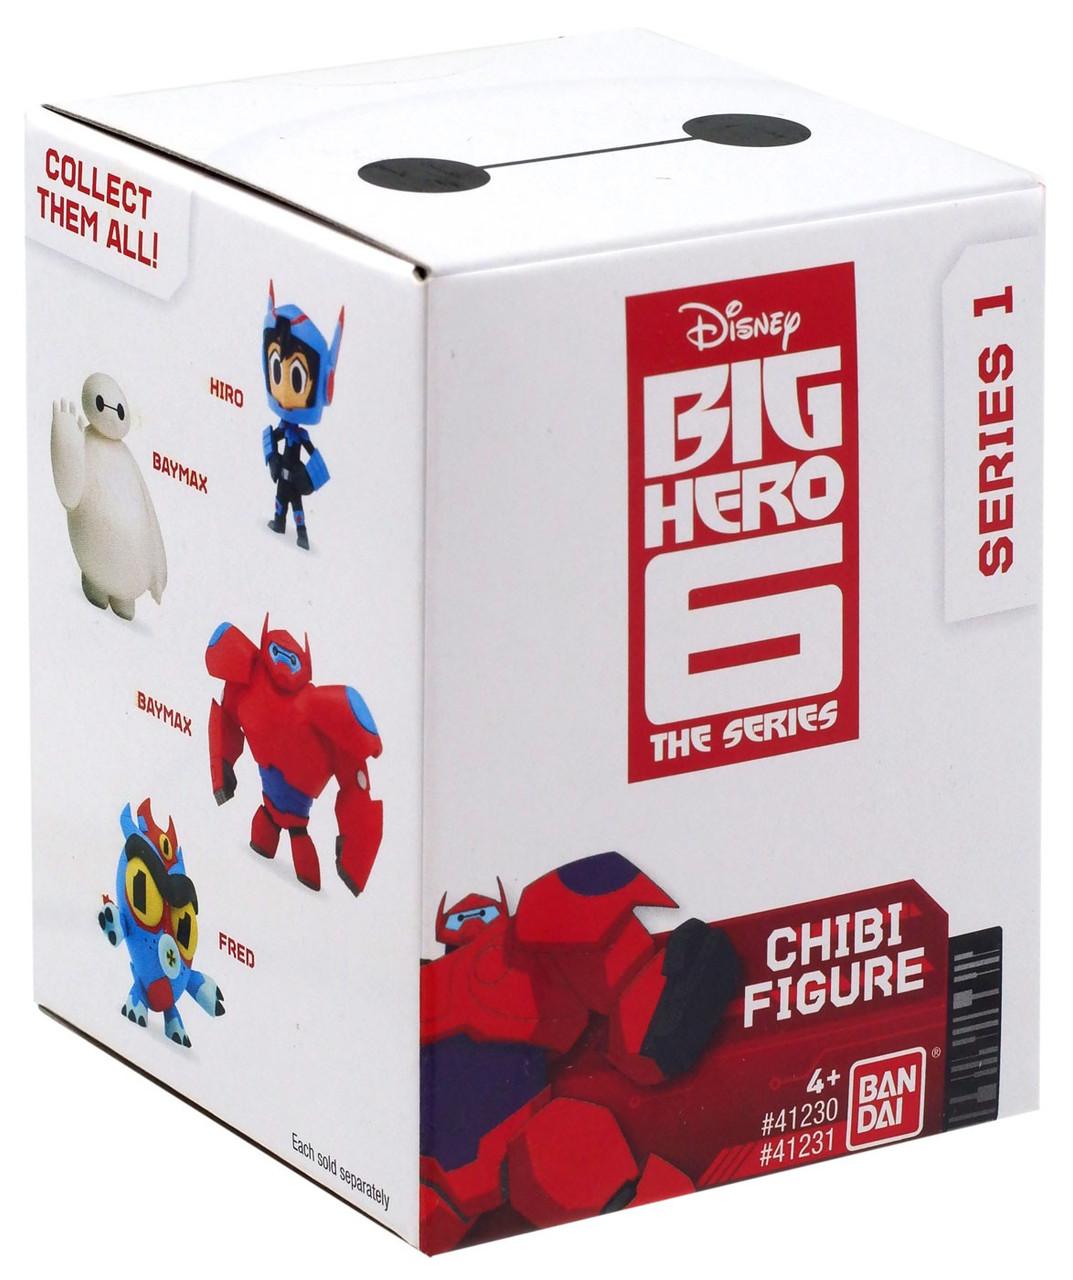 Big Hero 6 TV Series Chibi Figure Display Box